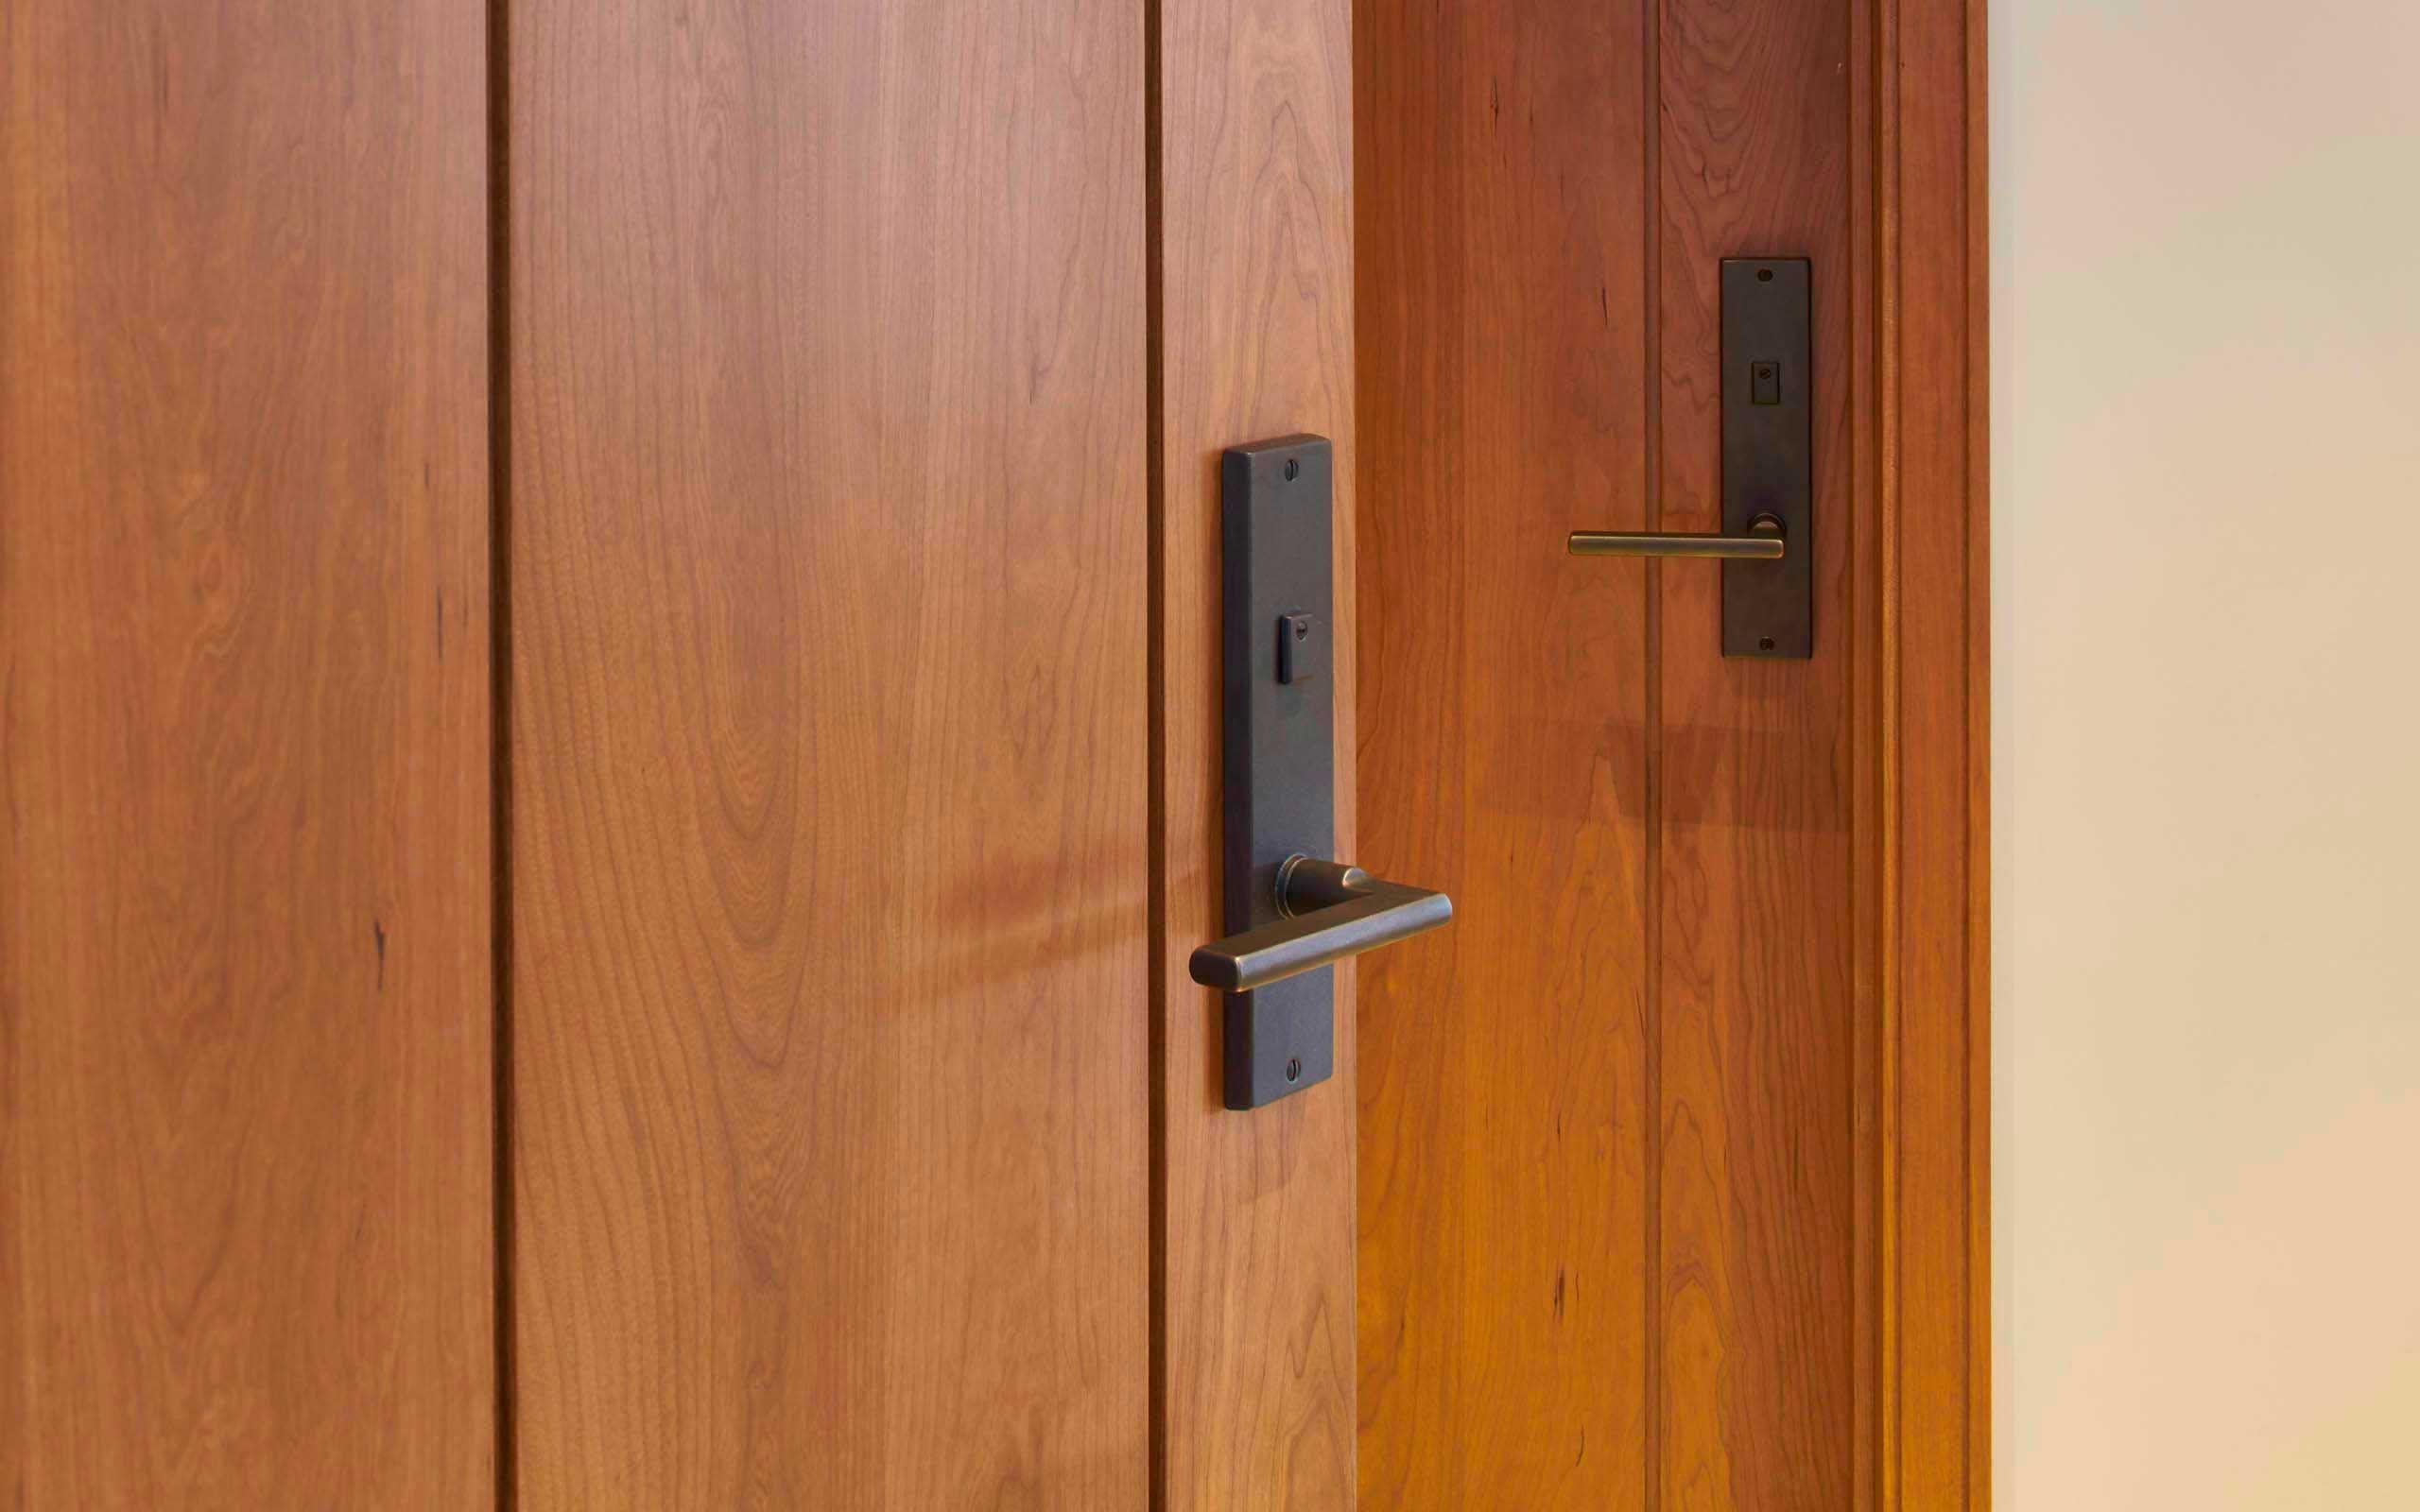 how to unlock bathroom door with hole on side